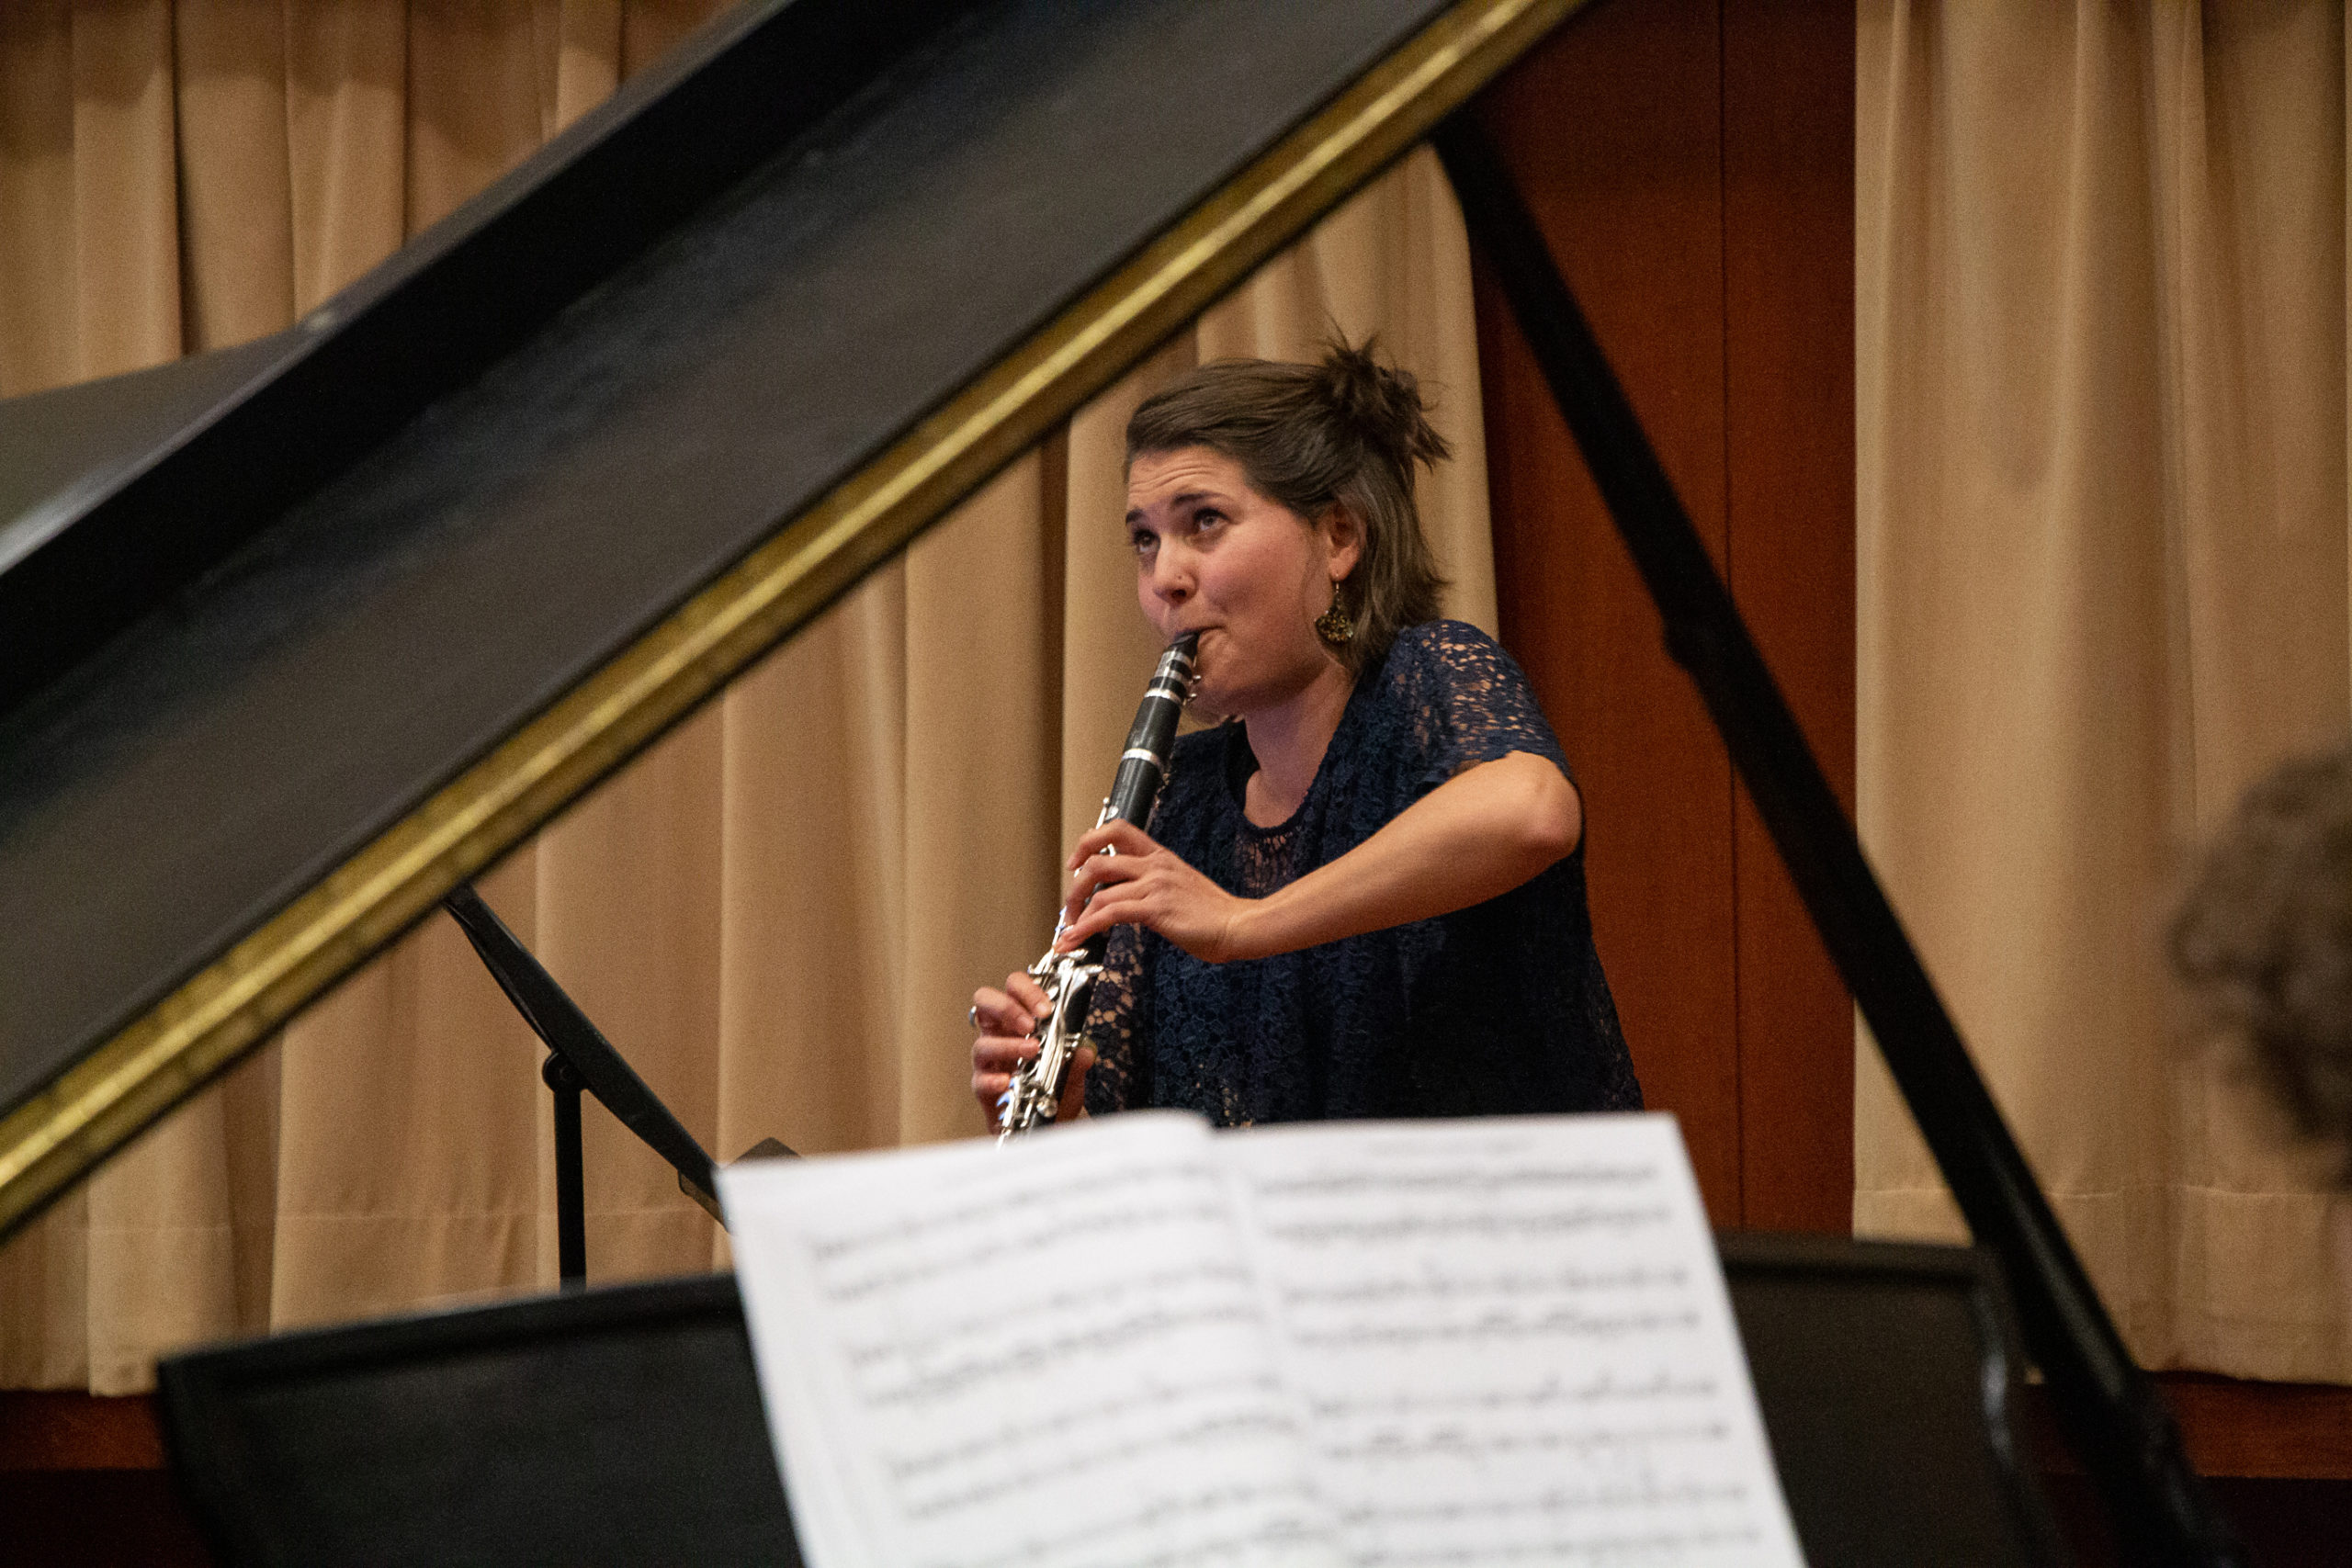 Yasmina playing the clarinet